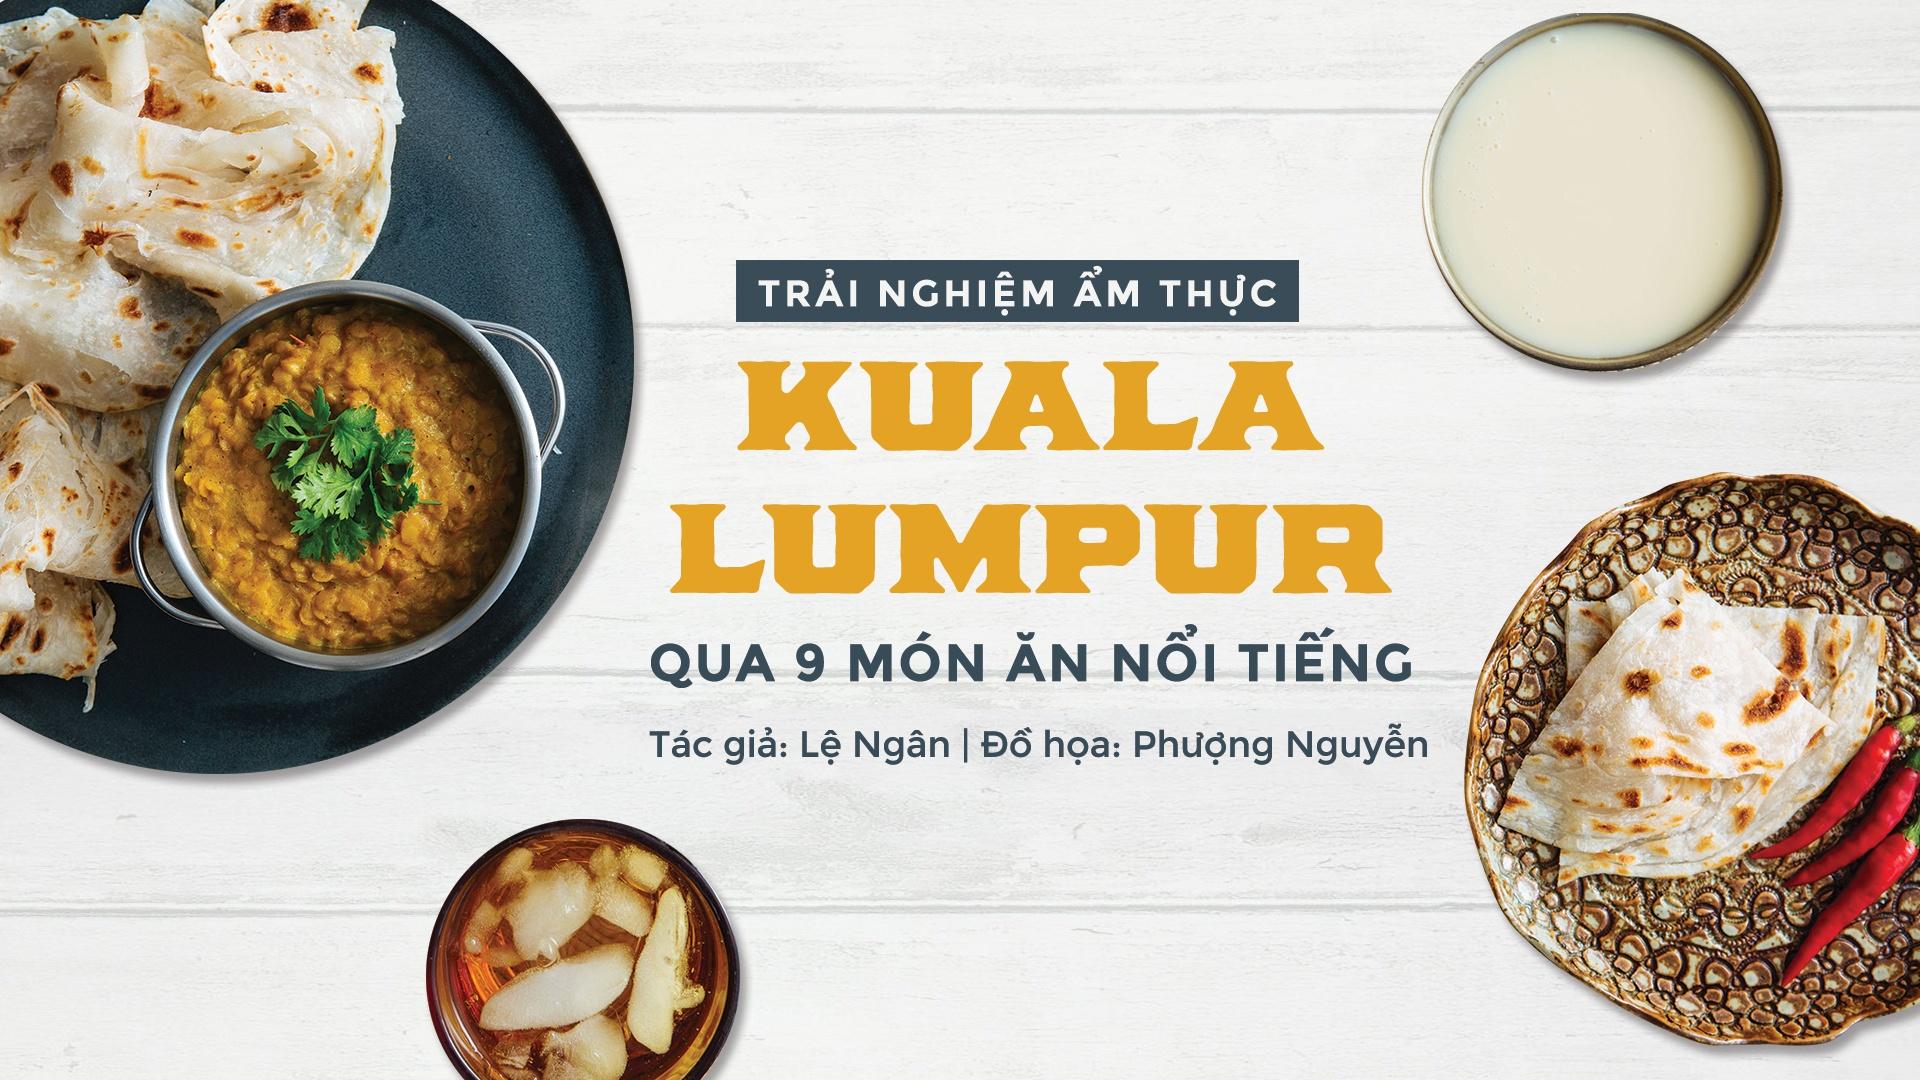 Trai nghiem am thuc Kuala Lumpur qua 9 mon an noi tieng hinh anh 1